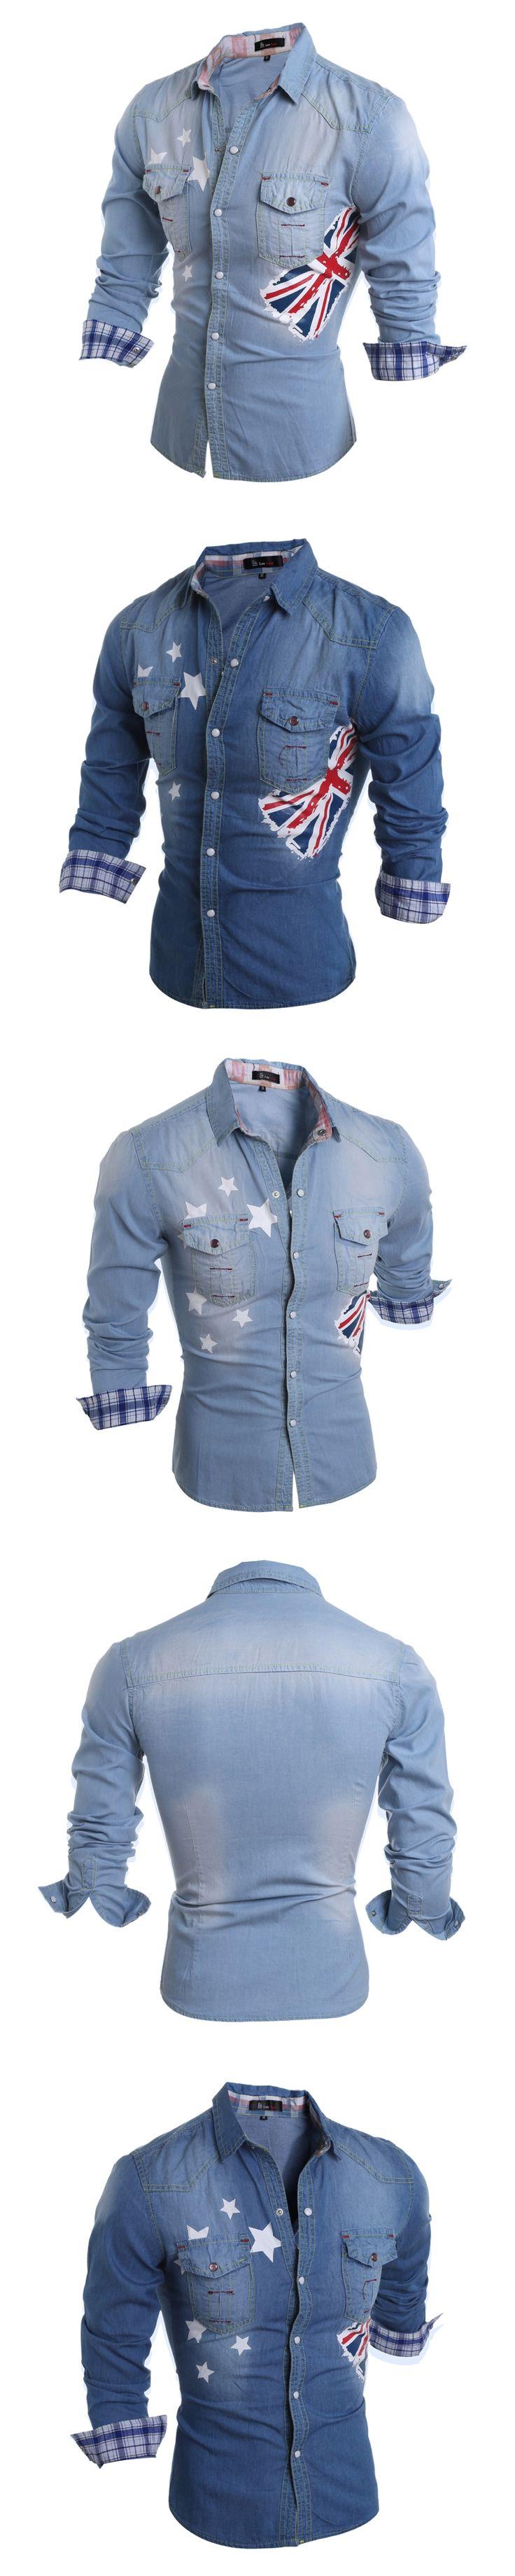 Men Shirt Size:M-2XL Autumn Winter Fashion Casual Men's Cotton Washed Printed Denim Shirts